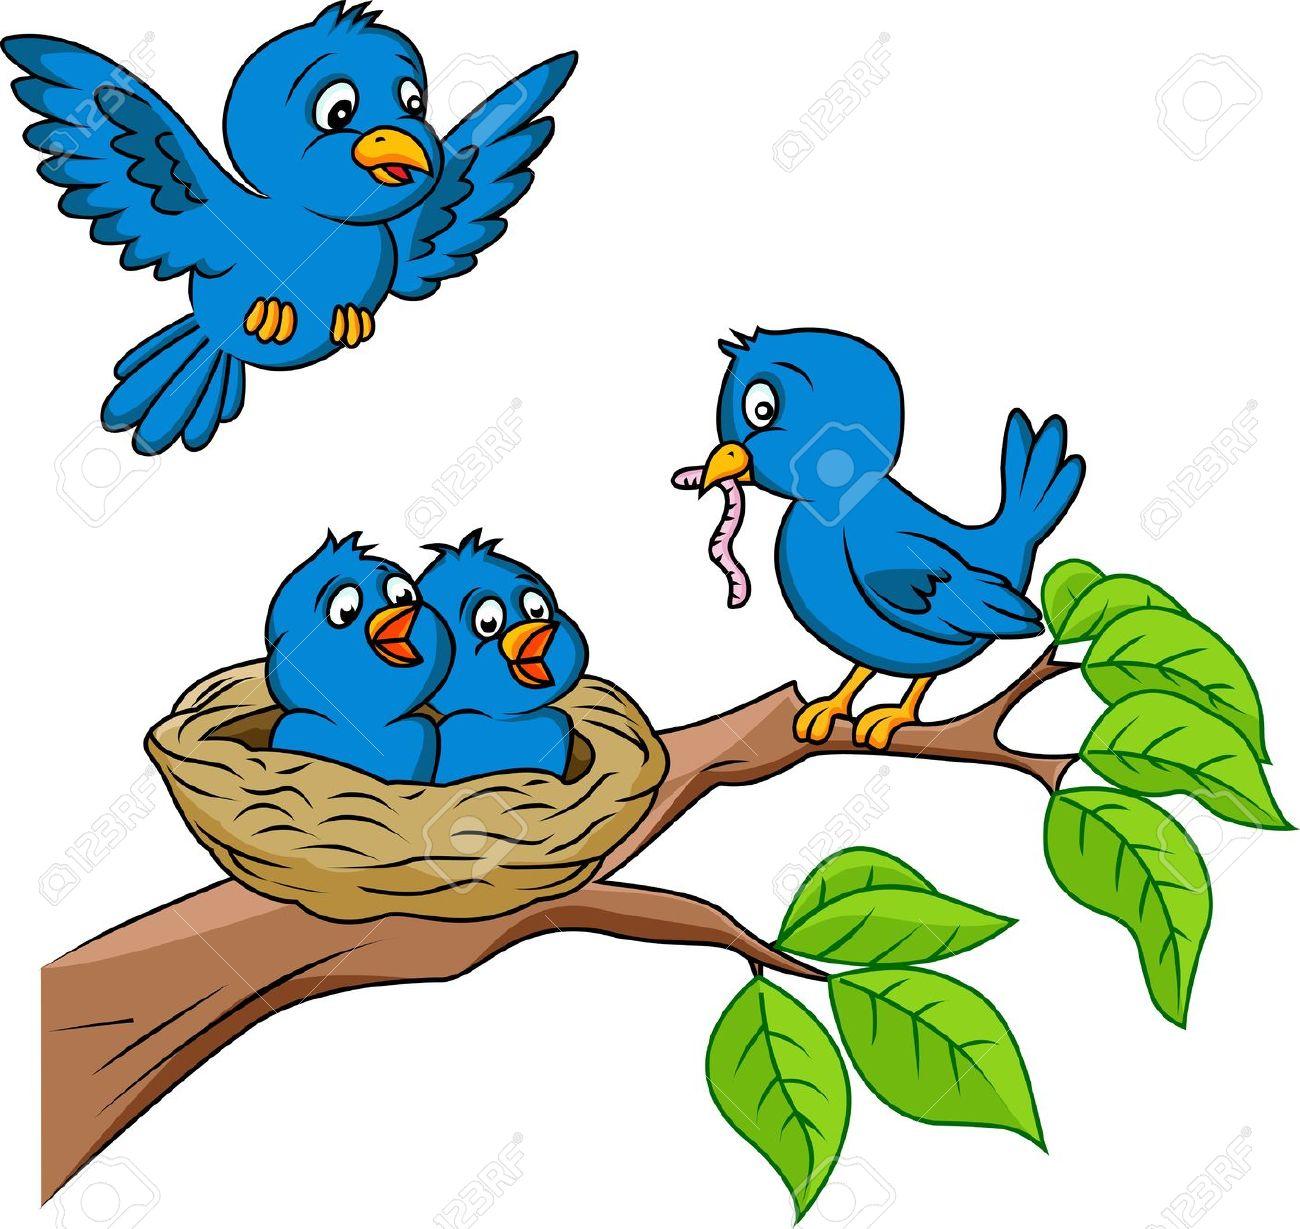 In free download best. Nest clipart baby bird